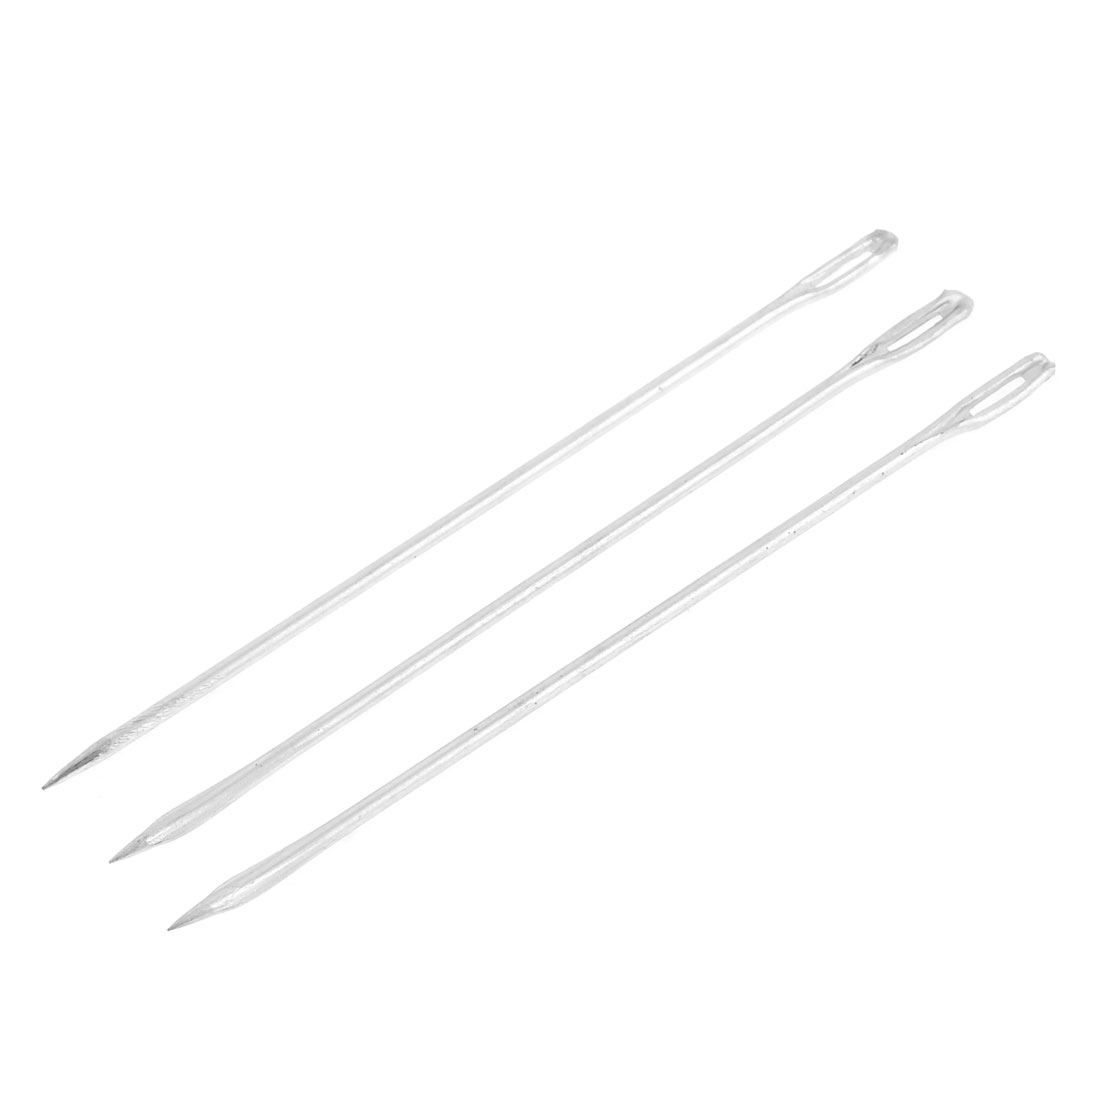 3 Pcs Silver Tone Metal Sack Bag Packing Stitching Needles 13.5cm Length